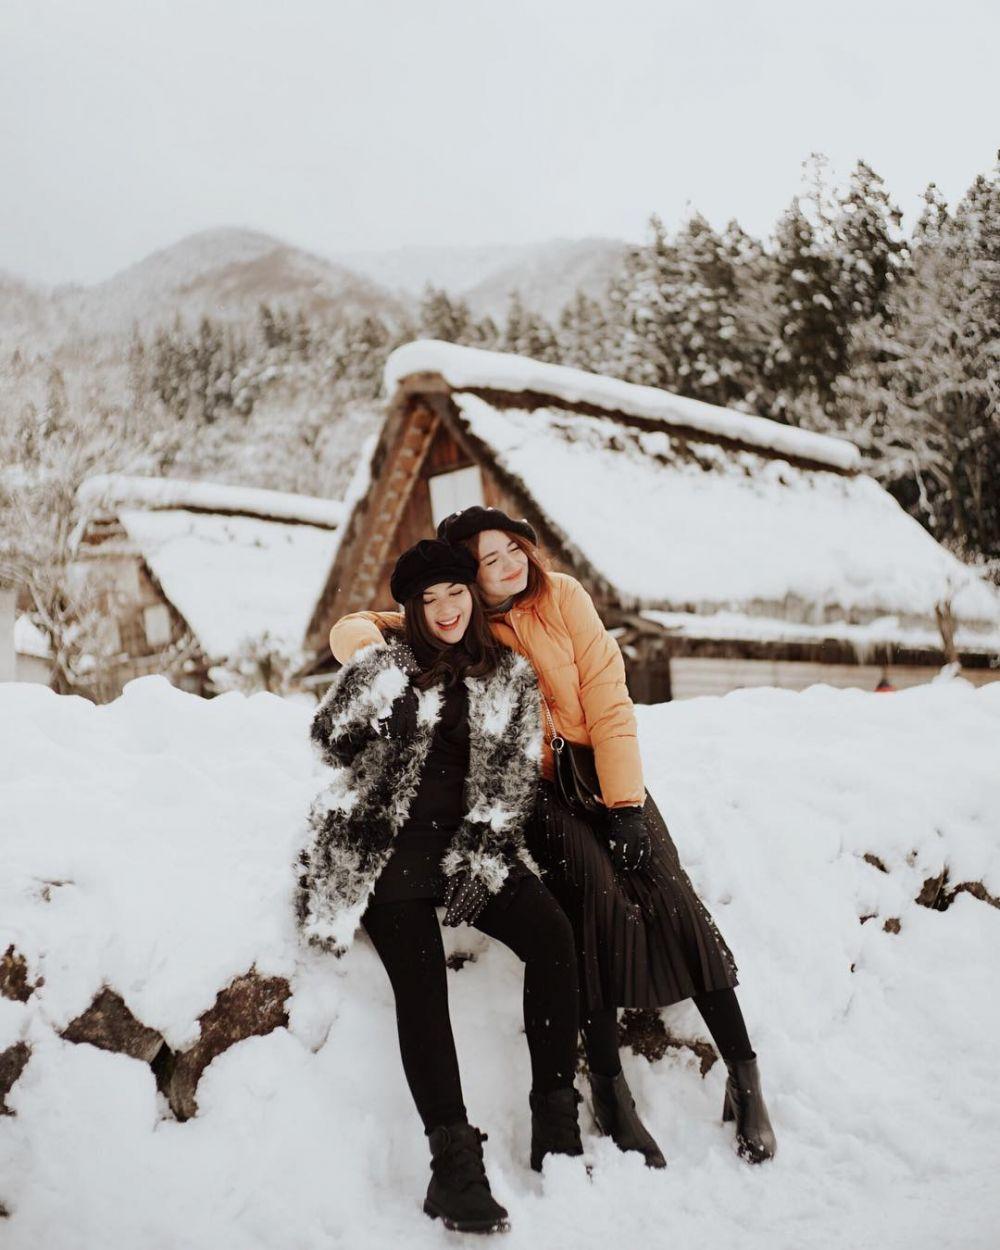 Persahabatan Jessica Mila dan Enzy Storia © 2020 brilio.net